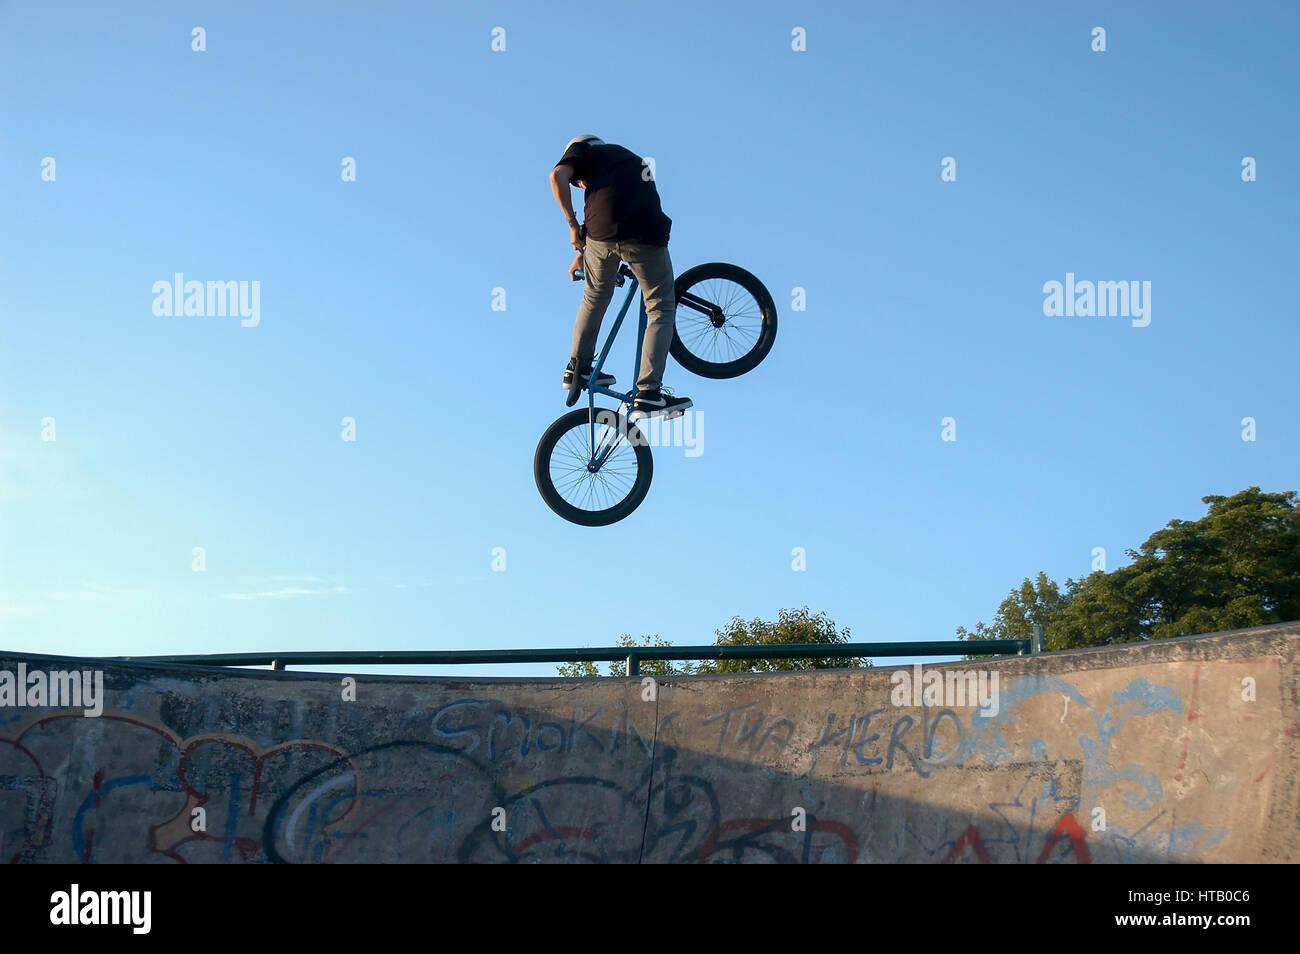 BMX biker leaps high against a blue sky. - Stock Image